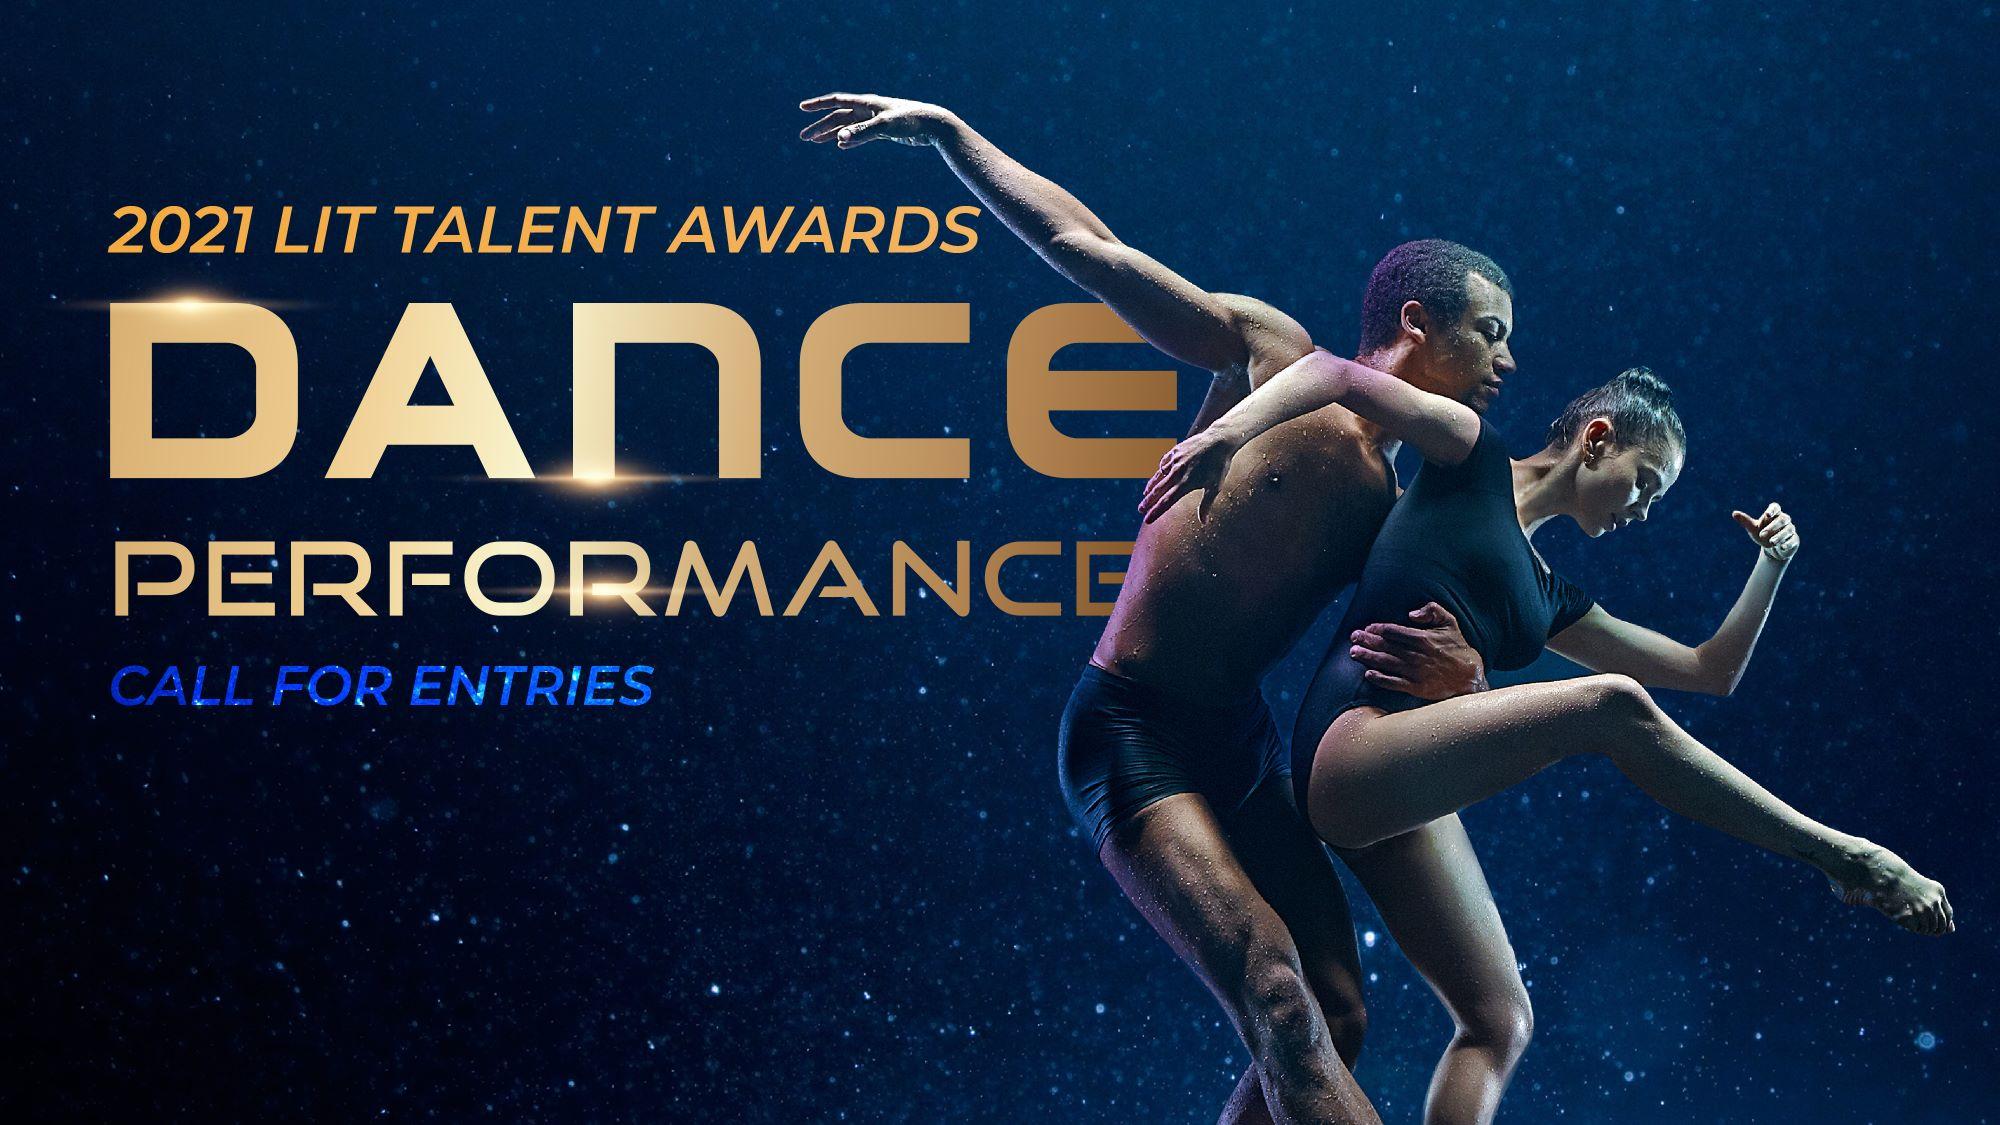 LIT Talent Awards | Dance Performance